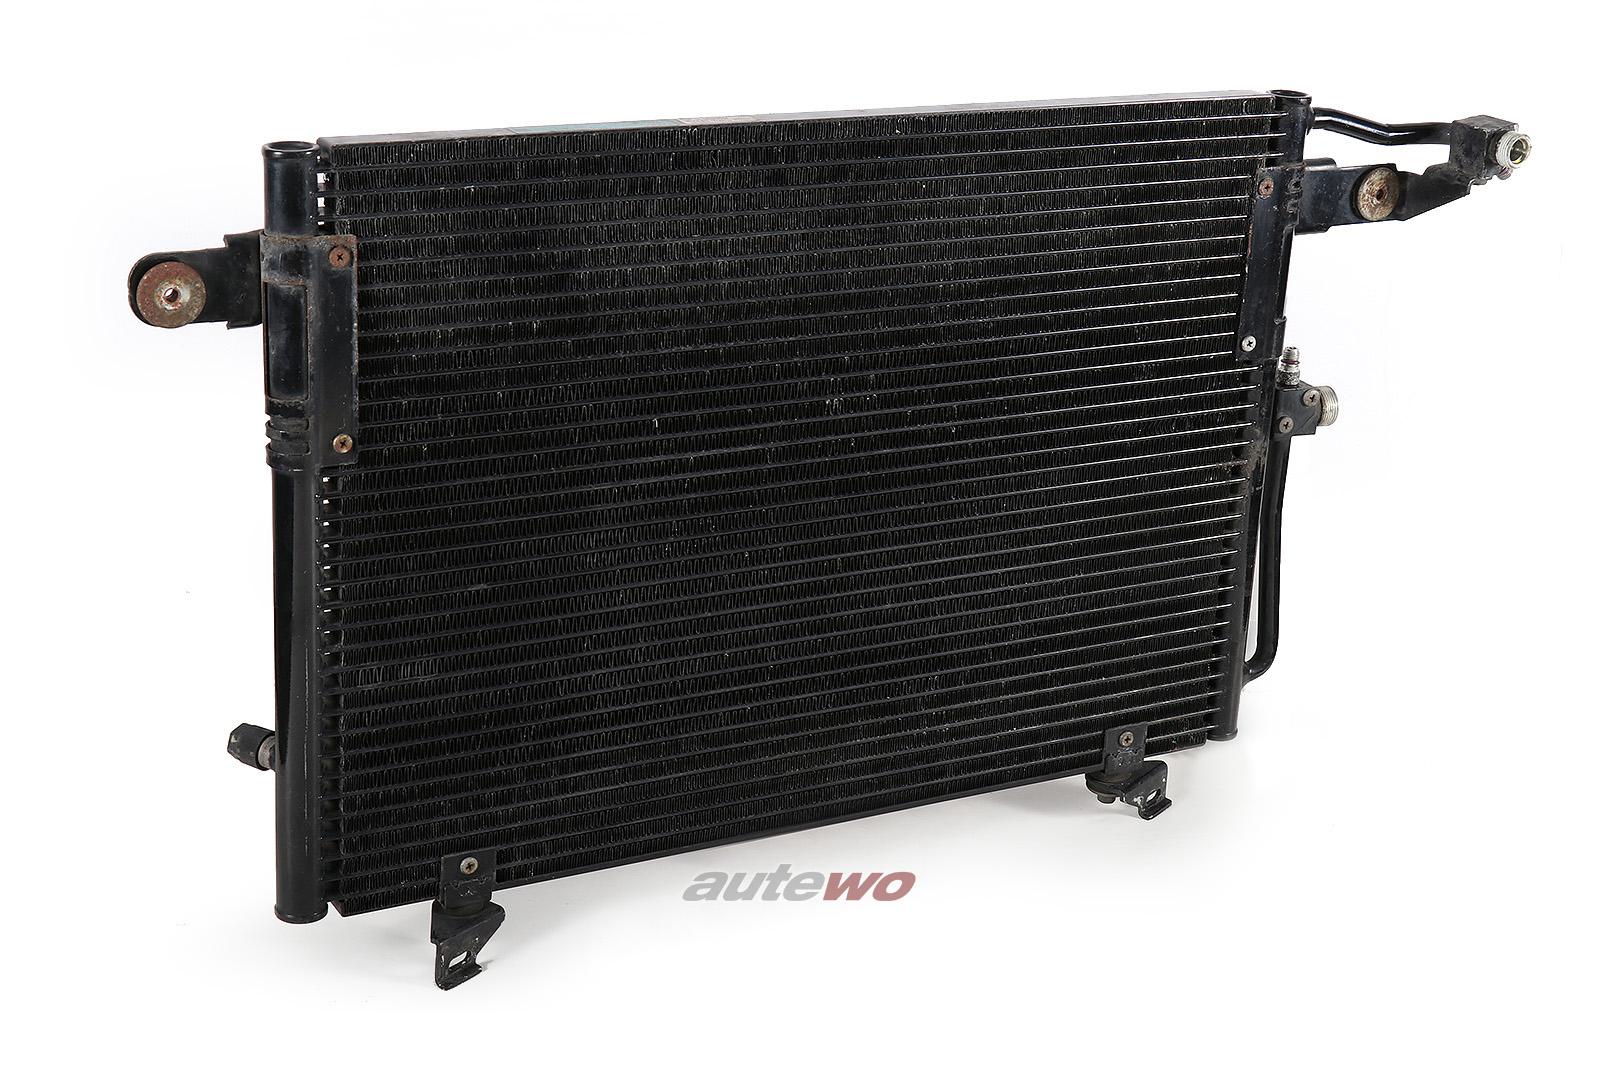 4A0260401AC 4A0260403AC Audi 100/A6/S4/S6 C4 Klimakondensator R134A